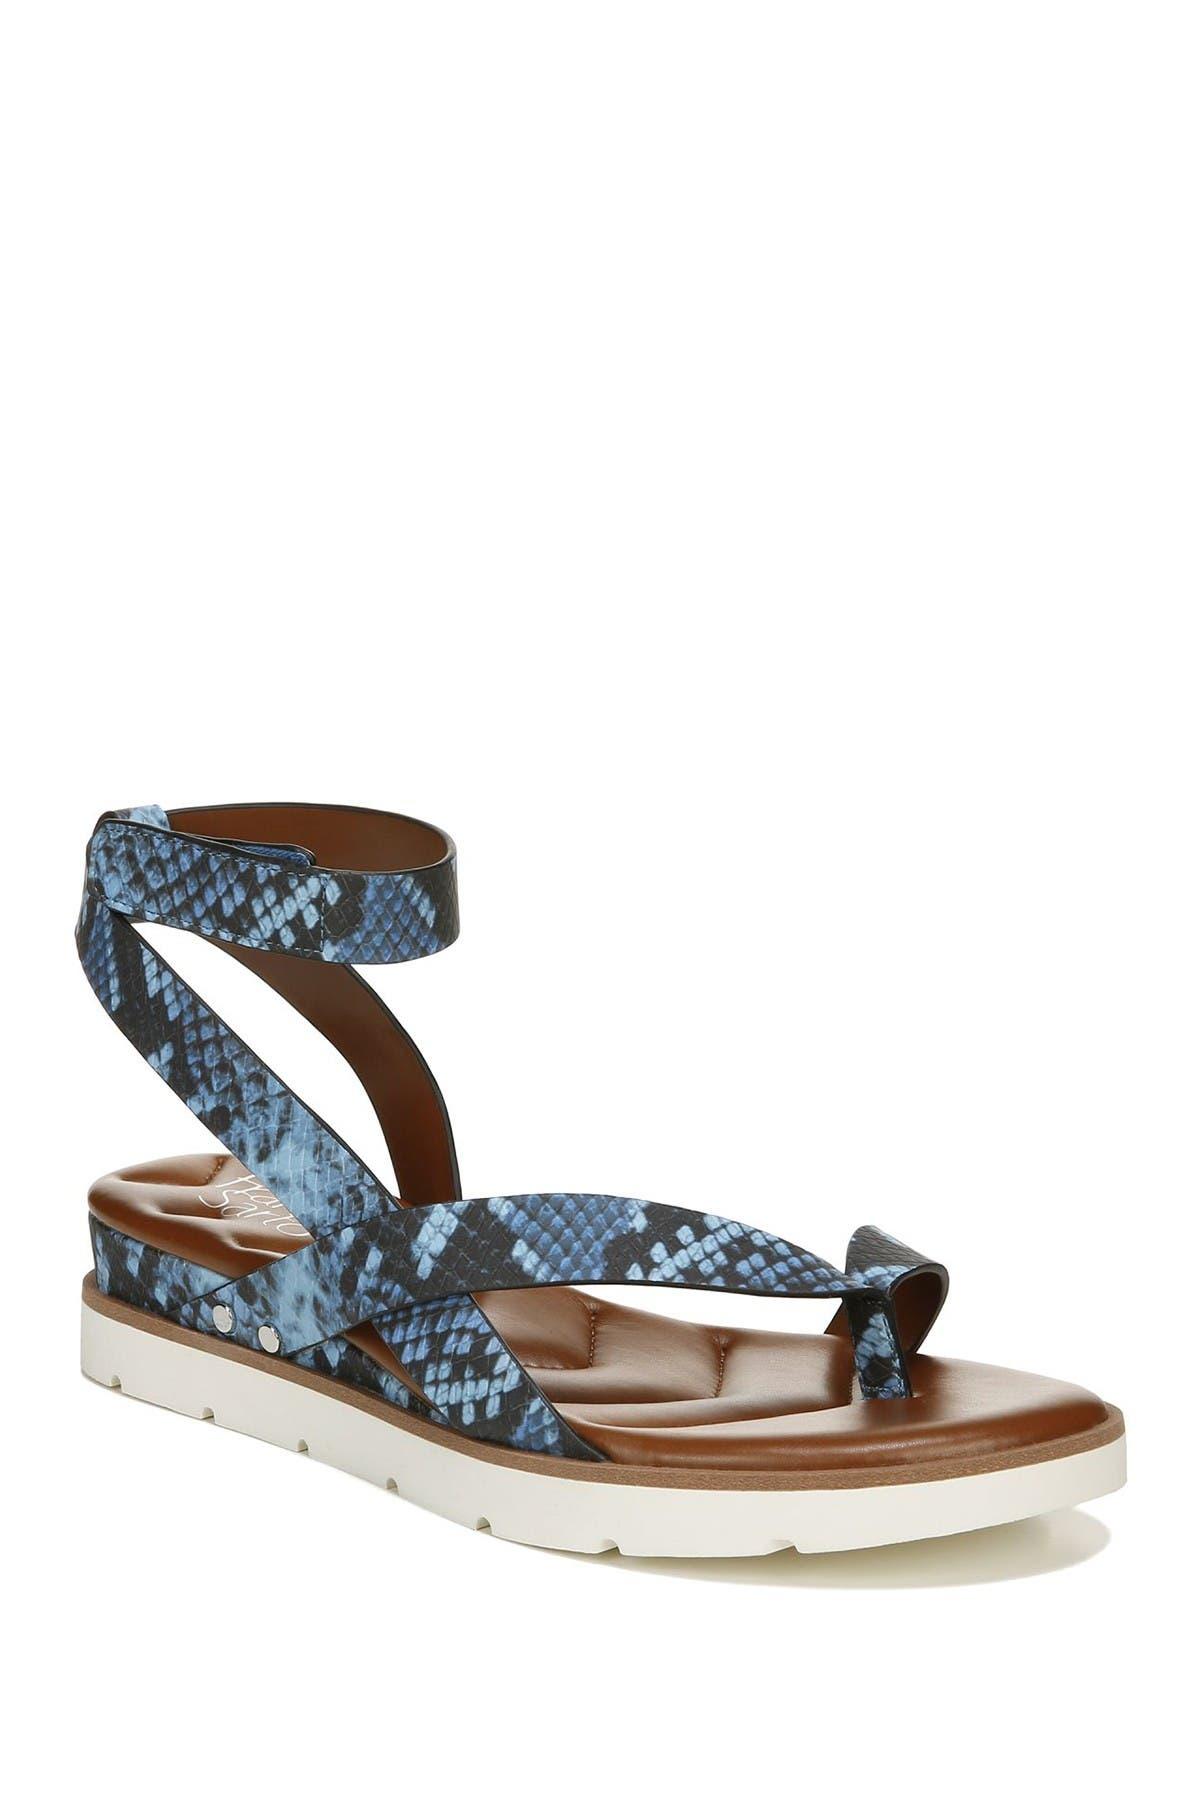 Image of Franco Sarto Delria Snake Embossed Ankle Strap Sandal